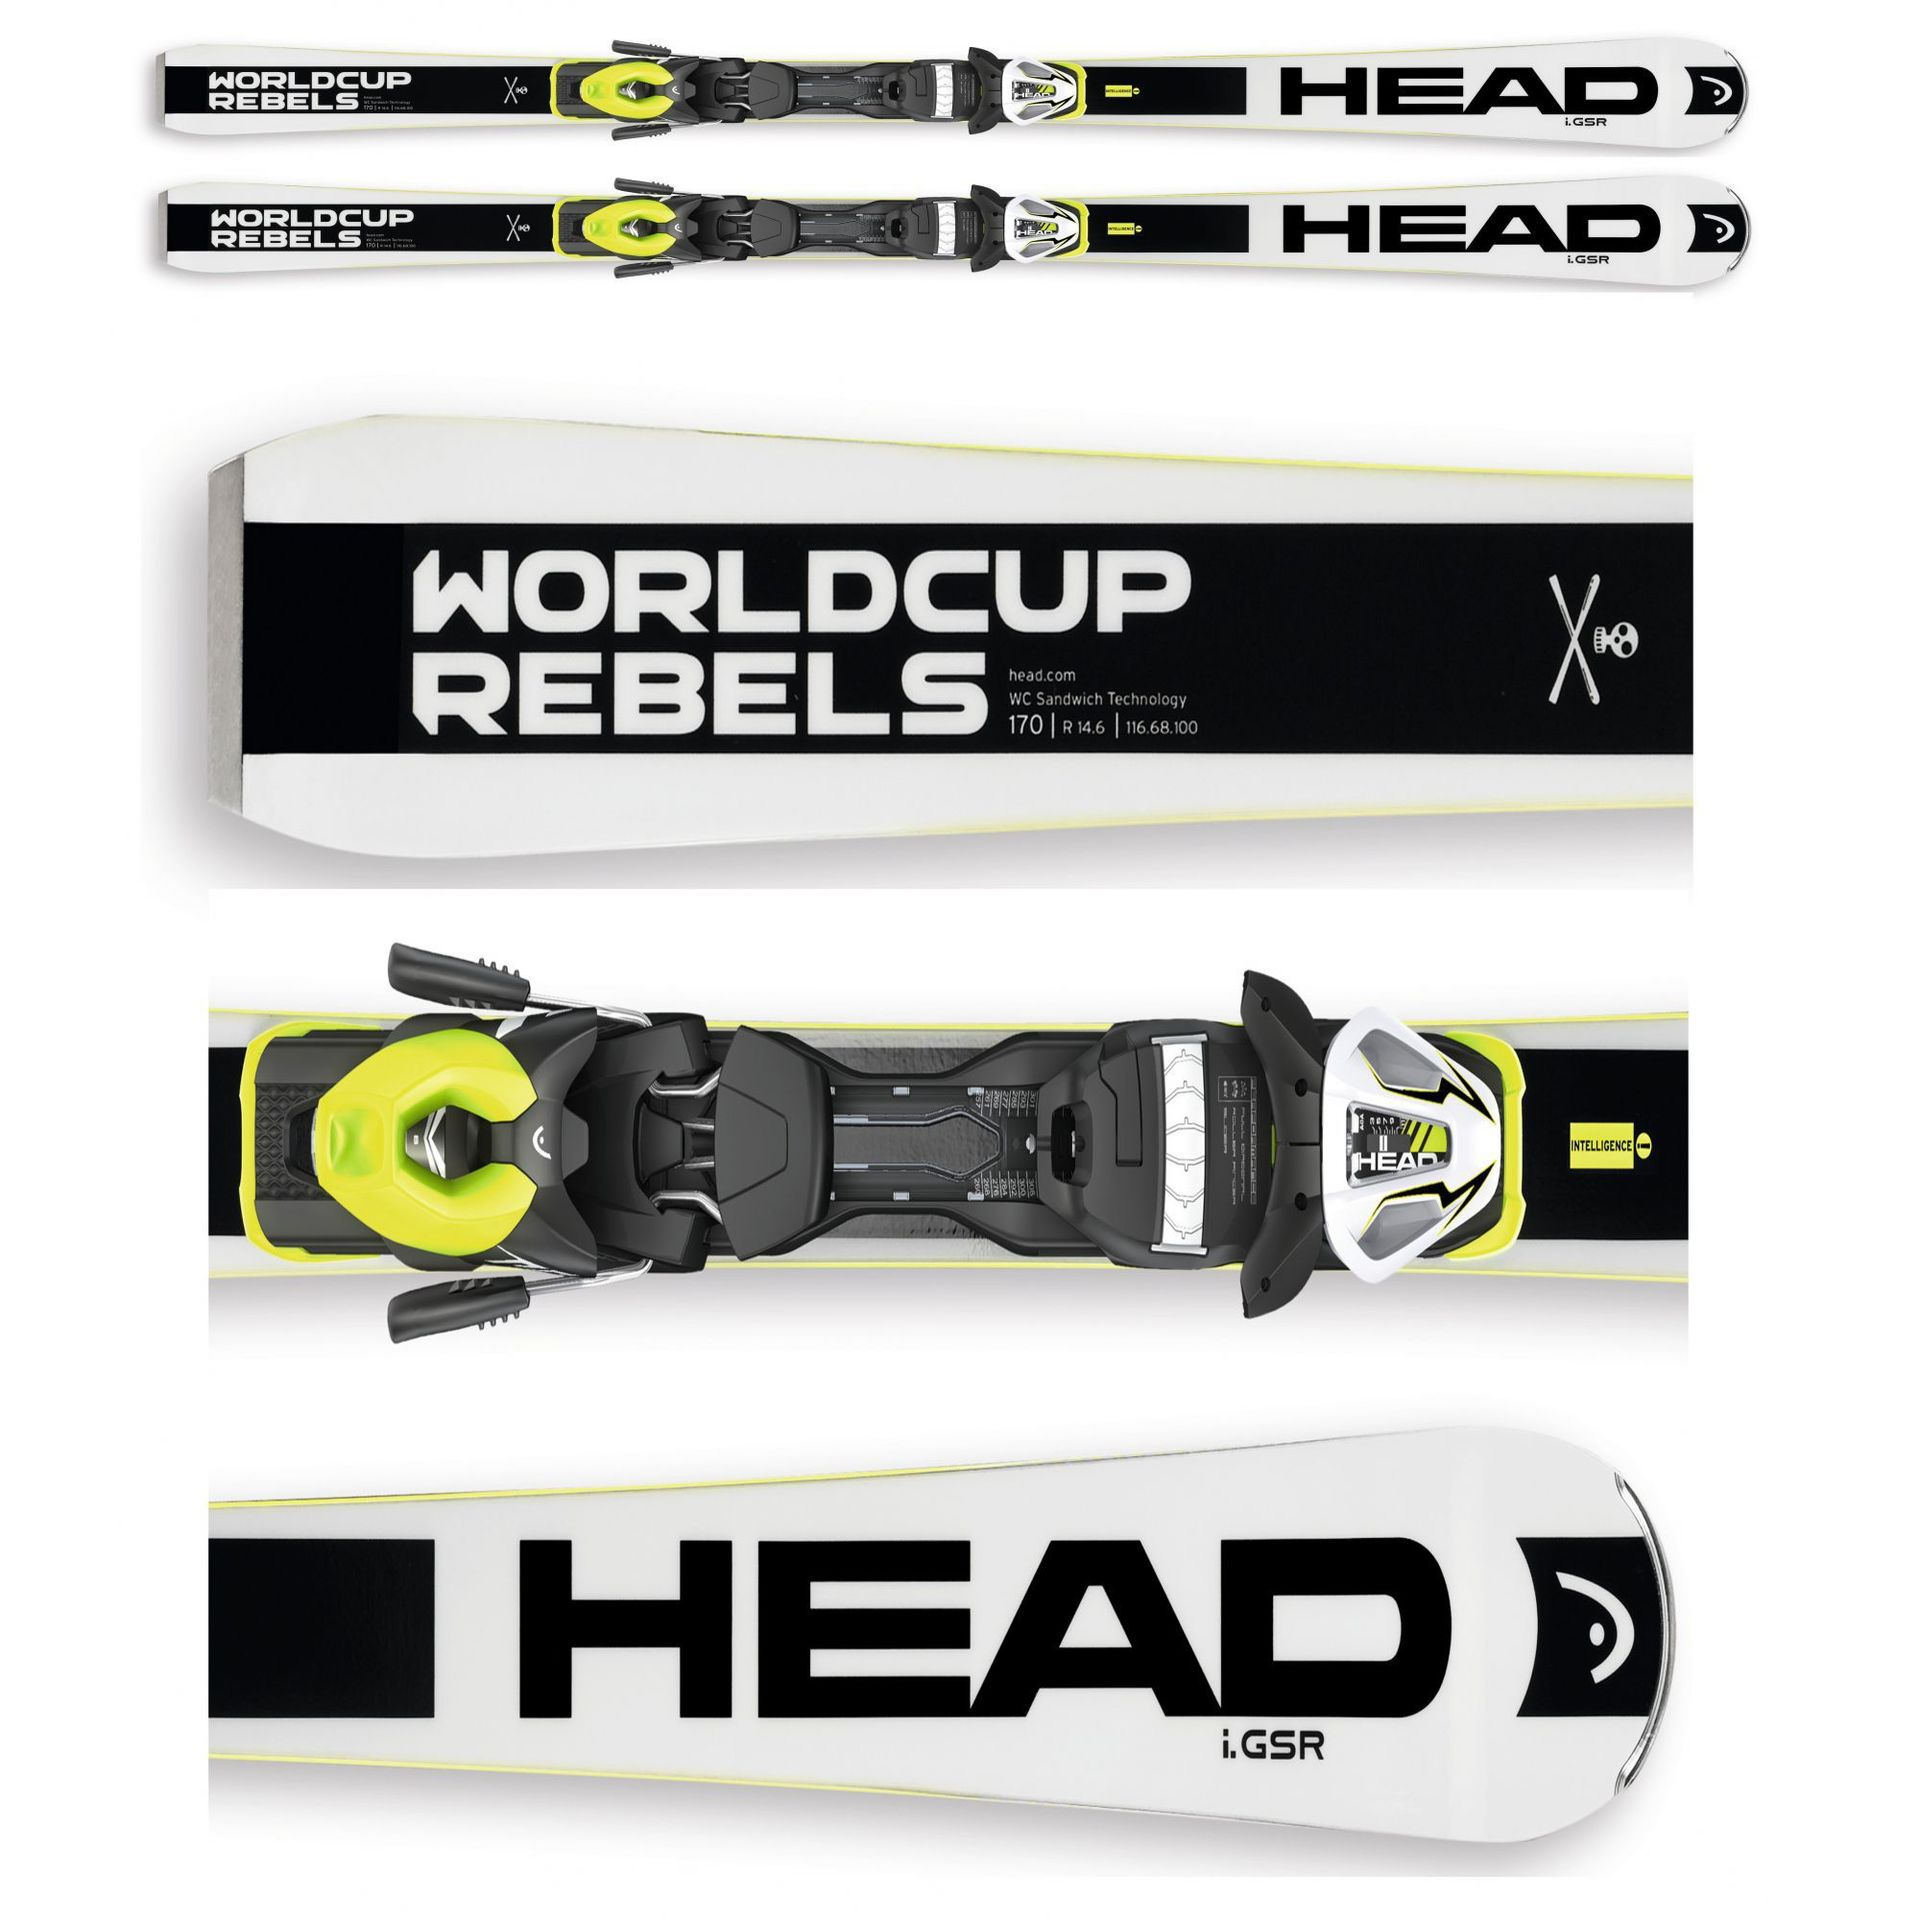 NARTY HEAD WORLDCUP REBELS iGSR PR BK + WIĄZANIA PRX 12 S BRAKE 85